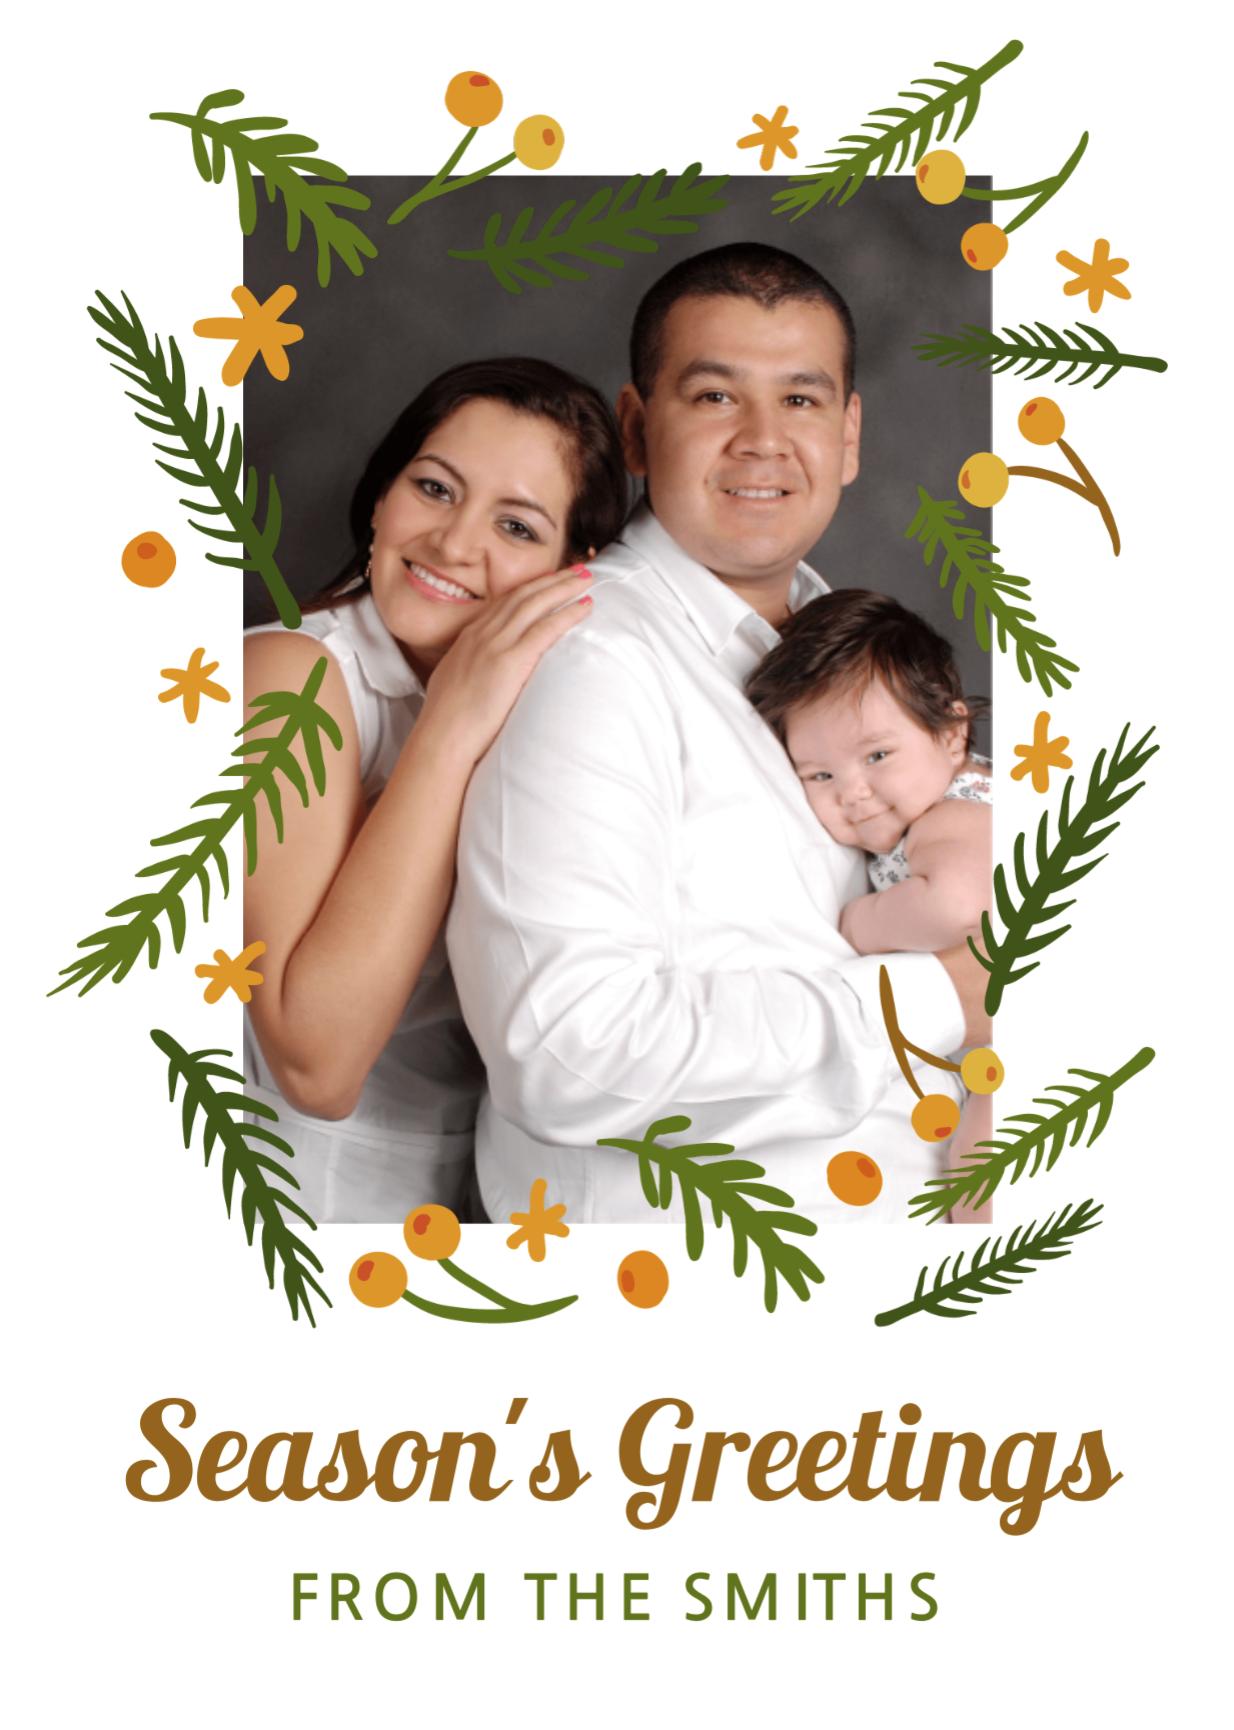 Family Season's Greeting Card Free personal templates